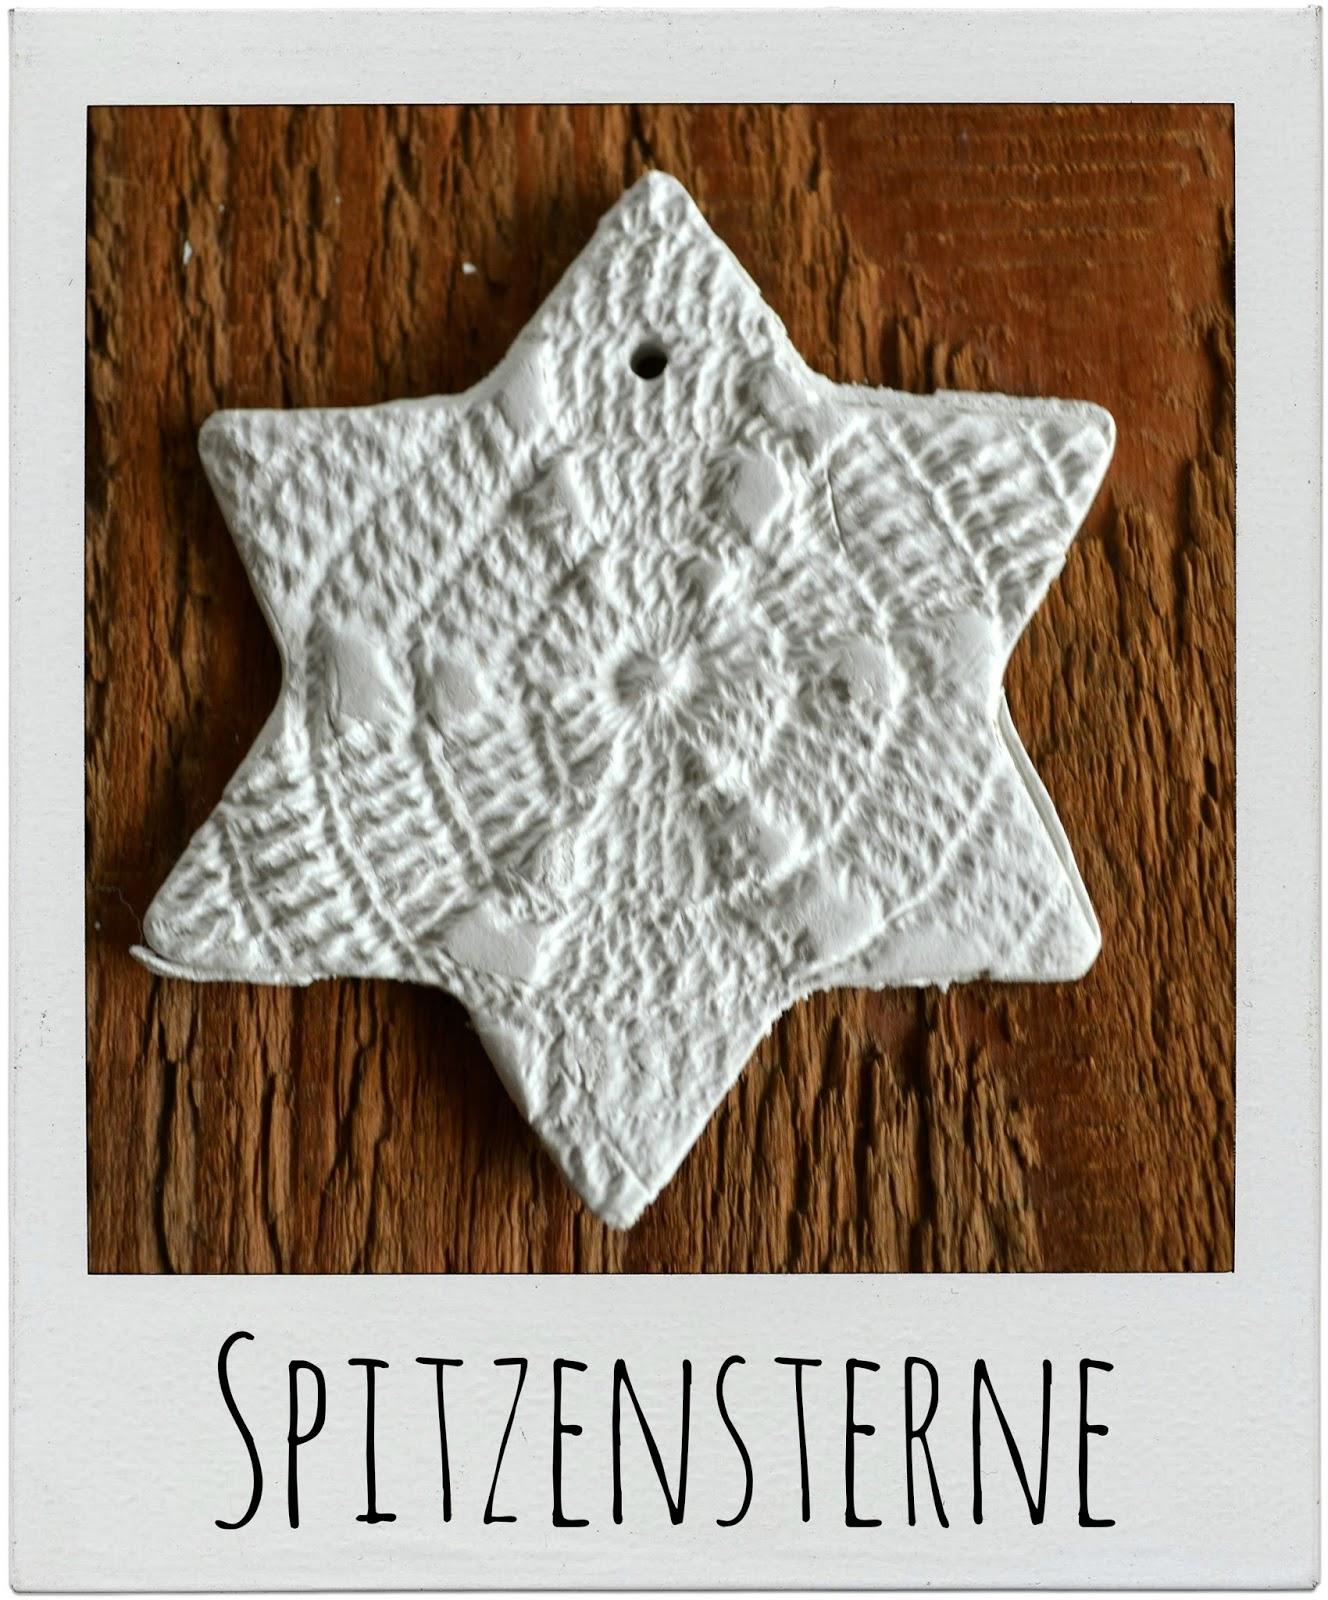 http://gemachtesundgedachtes.blogspot.de/2013/12/kinderleichte-baumanhanger.html